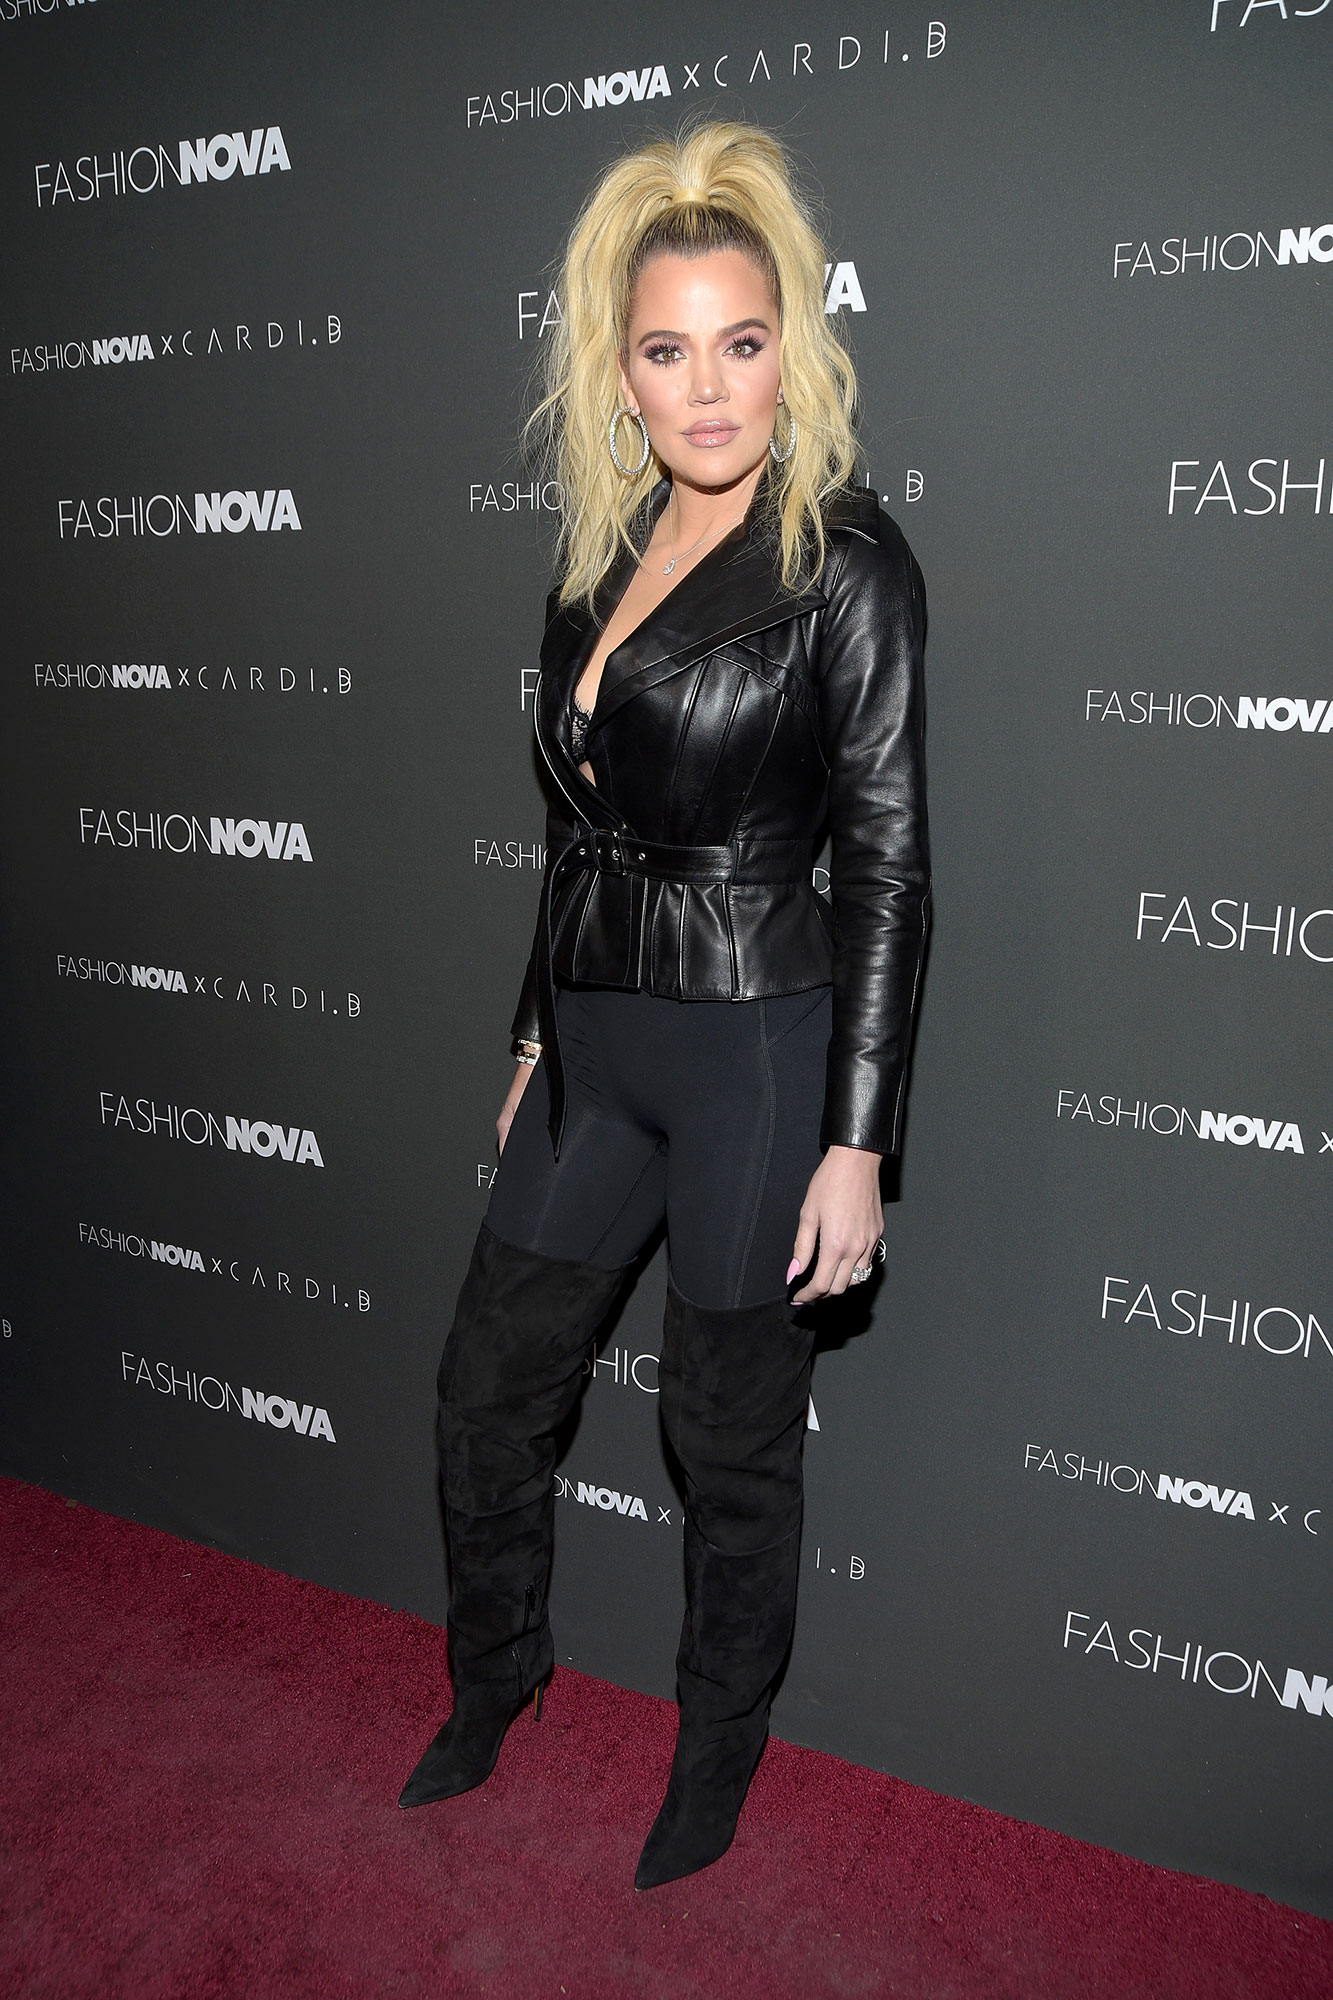 khloe kardashian posts cryptic message amid tristan thompson scandal - Khloe Kardashian attends the Fashion Nova x Cardi B collaboration launch event at Boulevard3 on November 14, 2018 in Hollywood, California